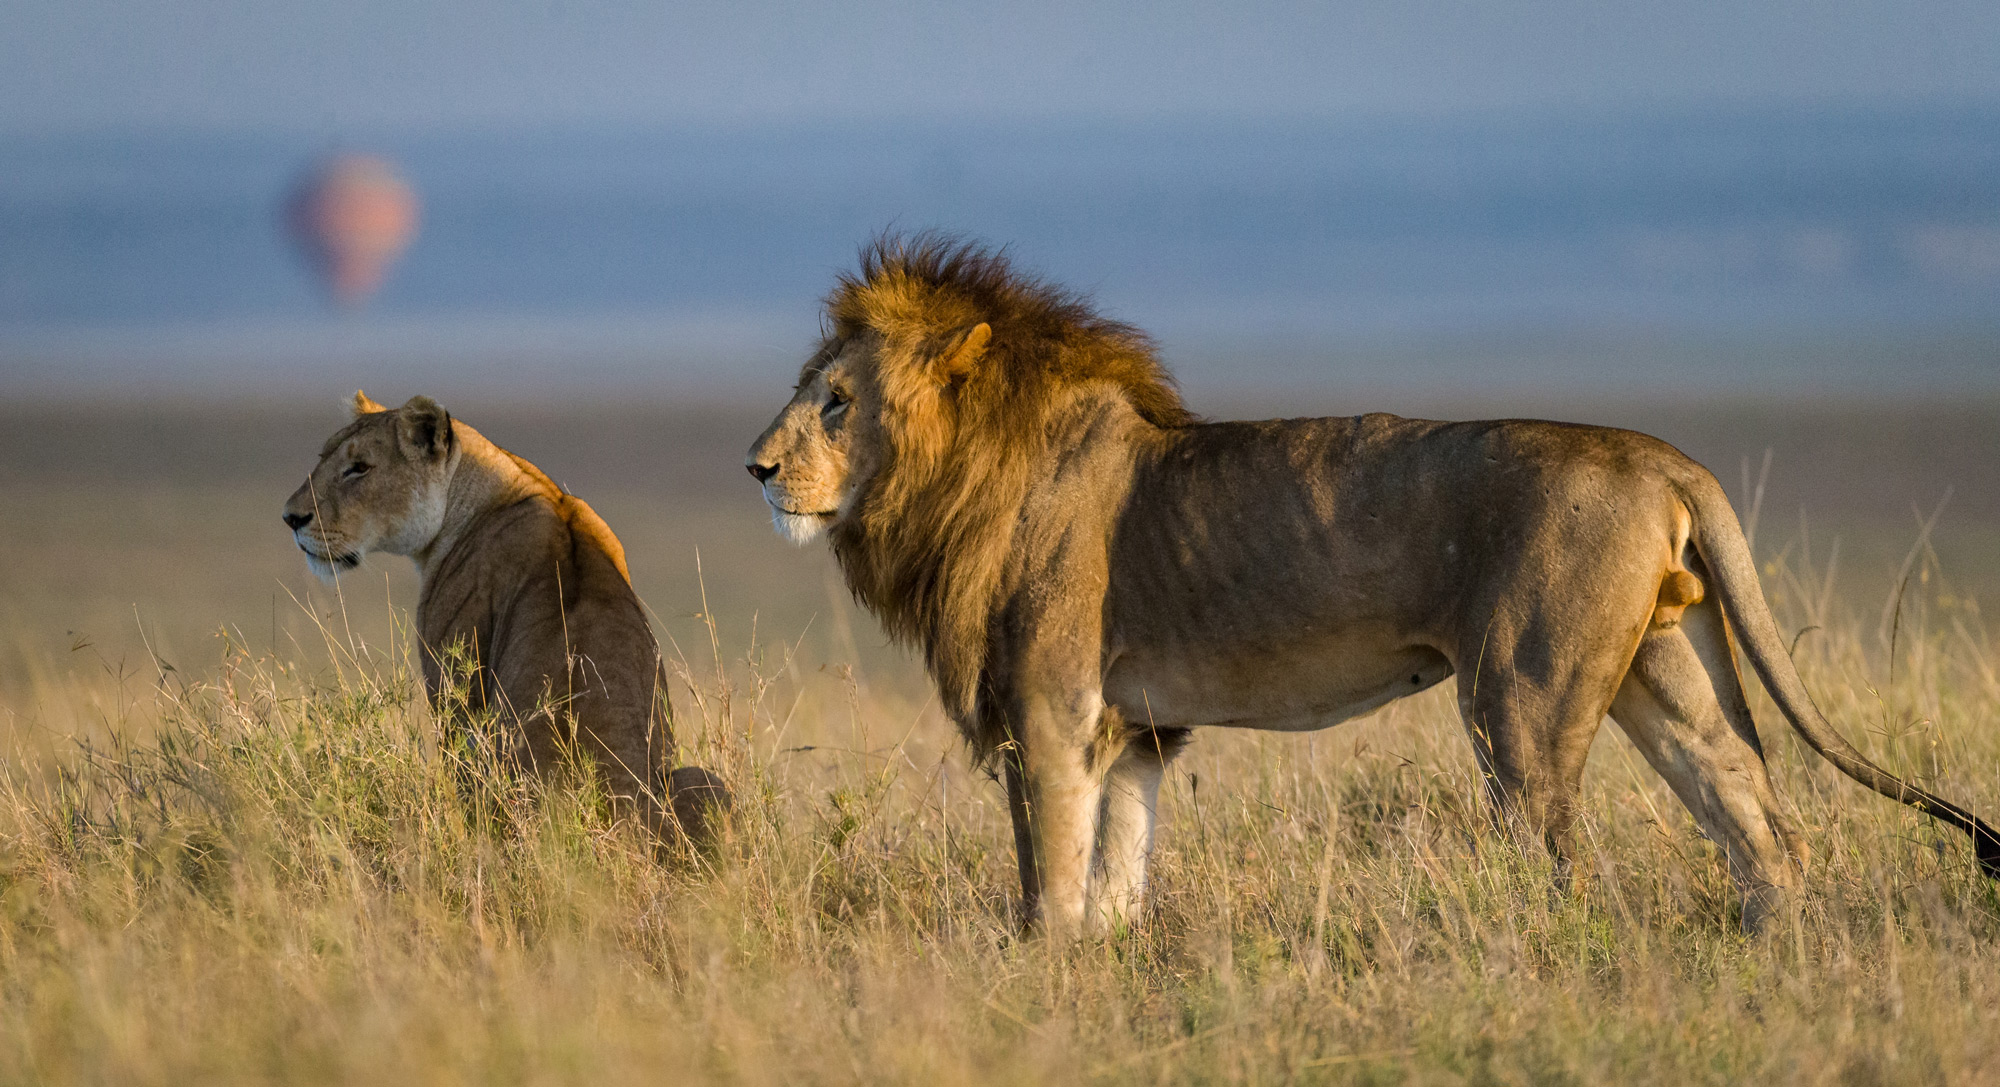 A lion and lioness scan the horizon as a hot air balloon takes off in the distance in the Maasai Mara ©Ruzdi Ekenheim